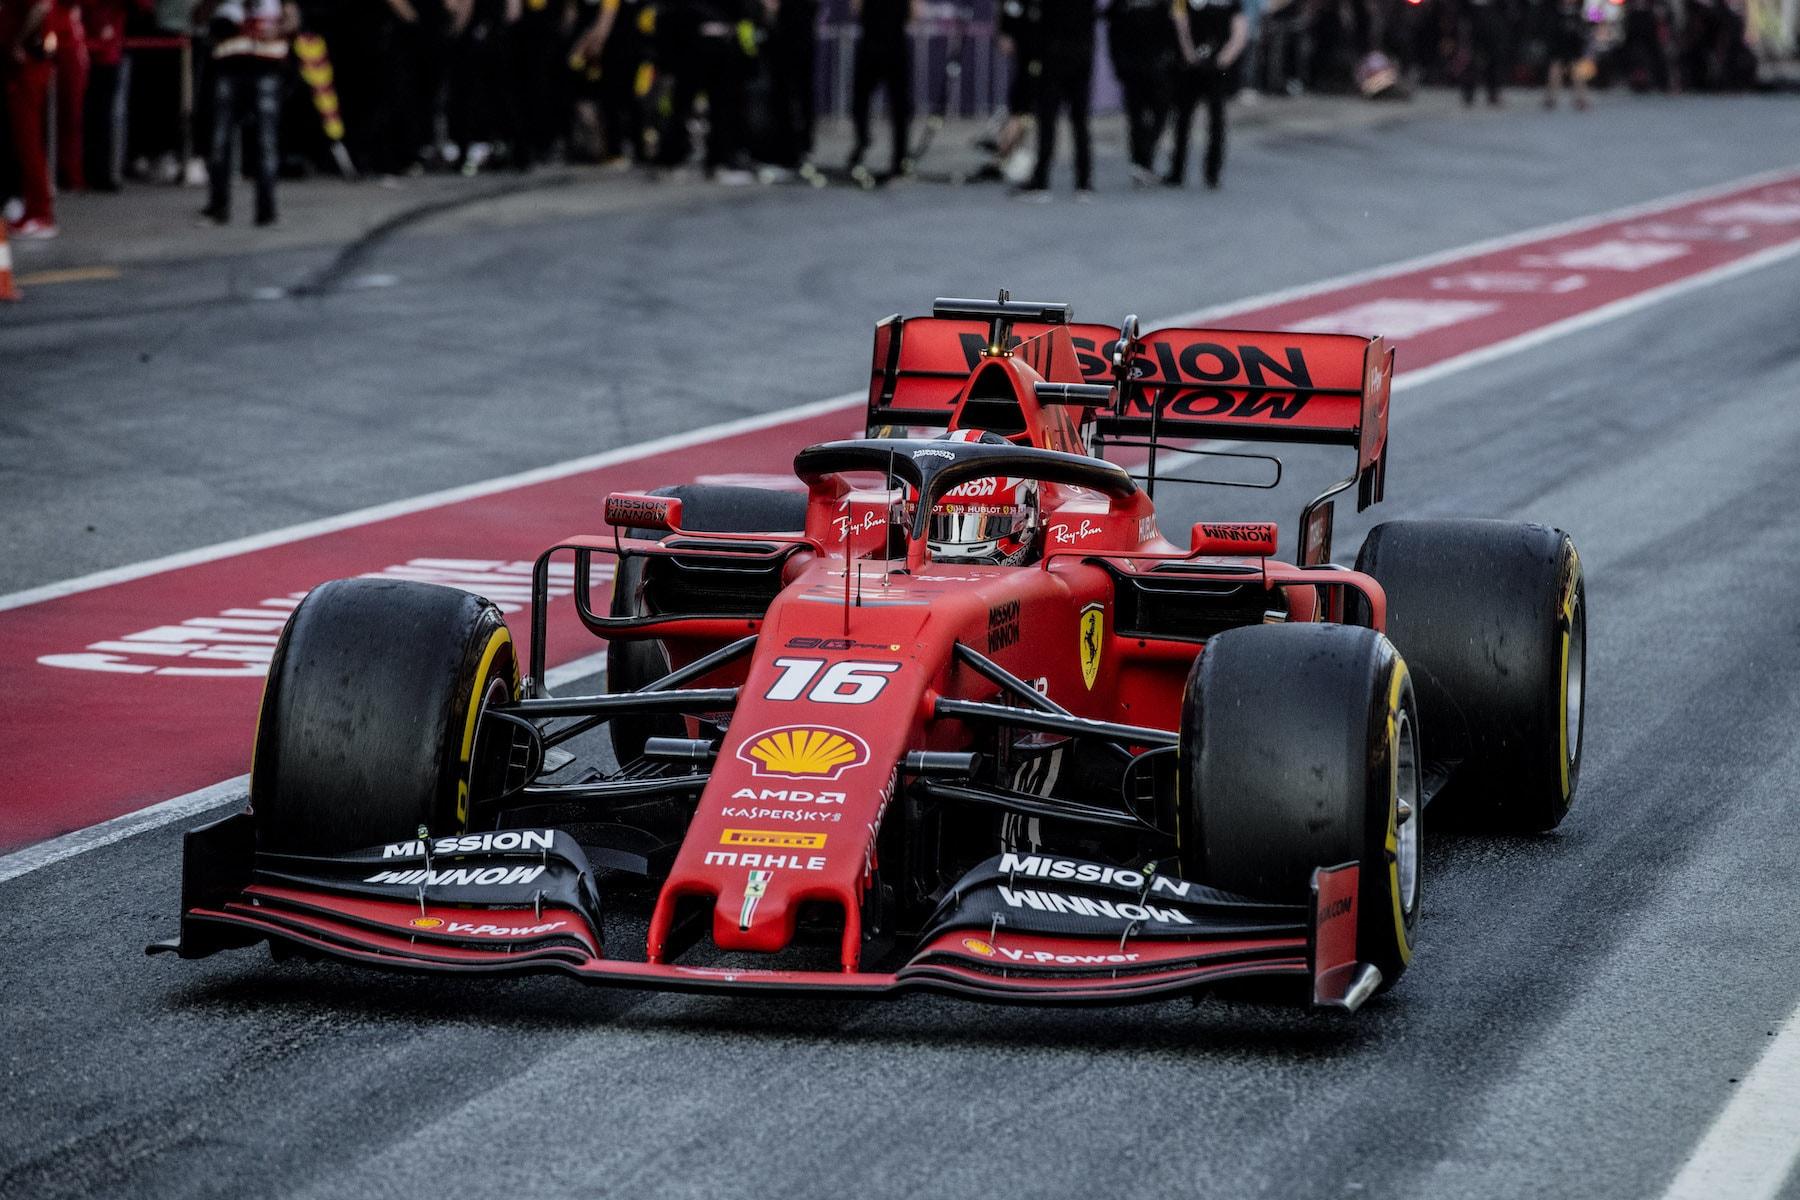 2019 Charles Leclerc | Ferrari SF90 | 2019 Barcelona T2 D3 2.jpg